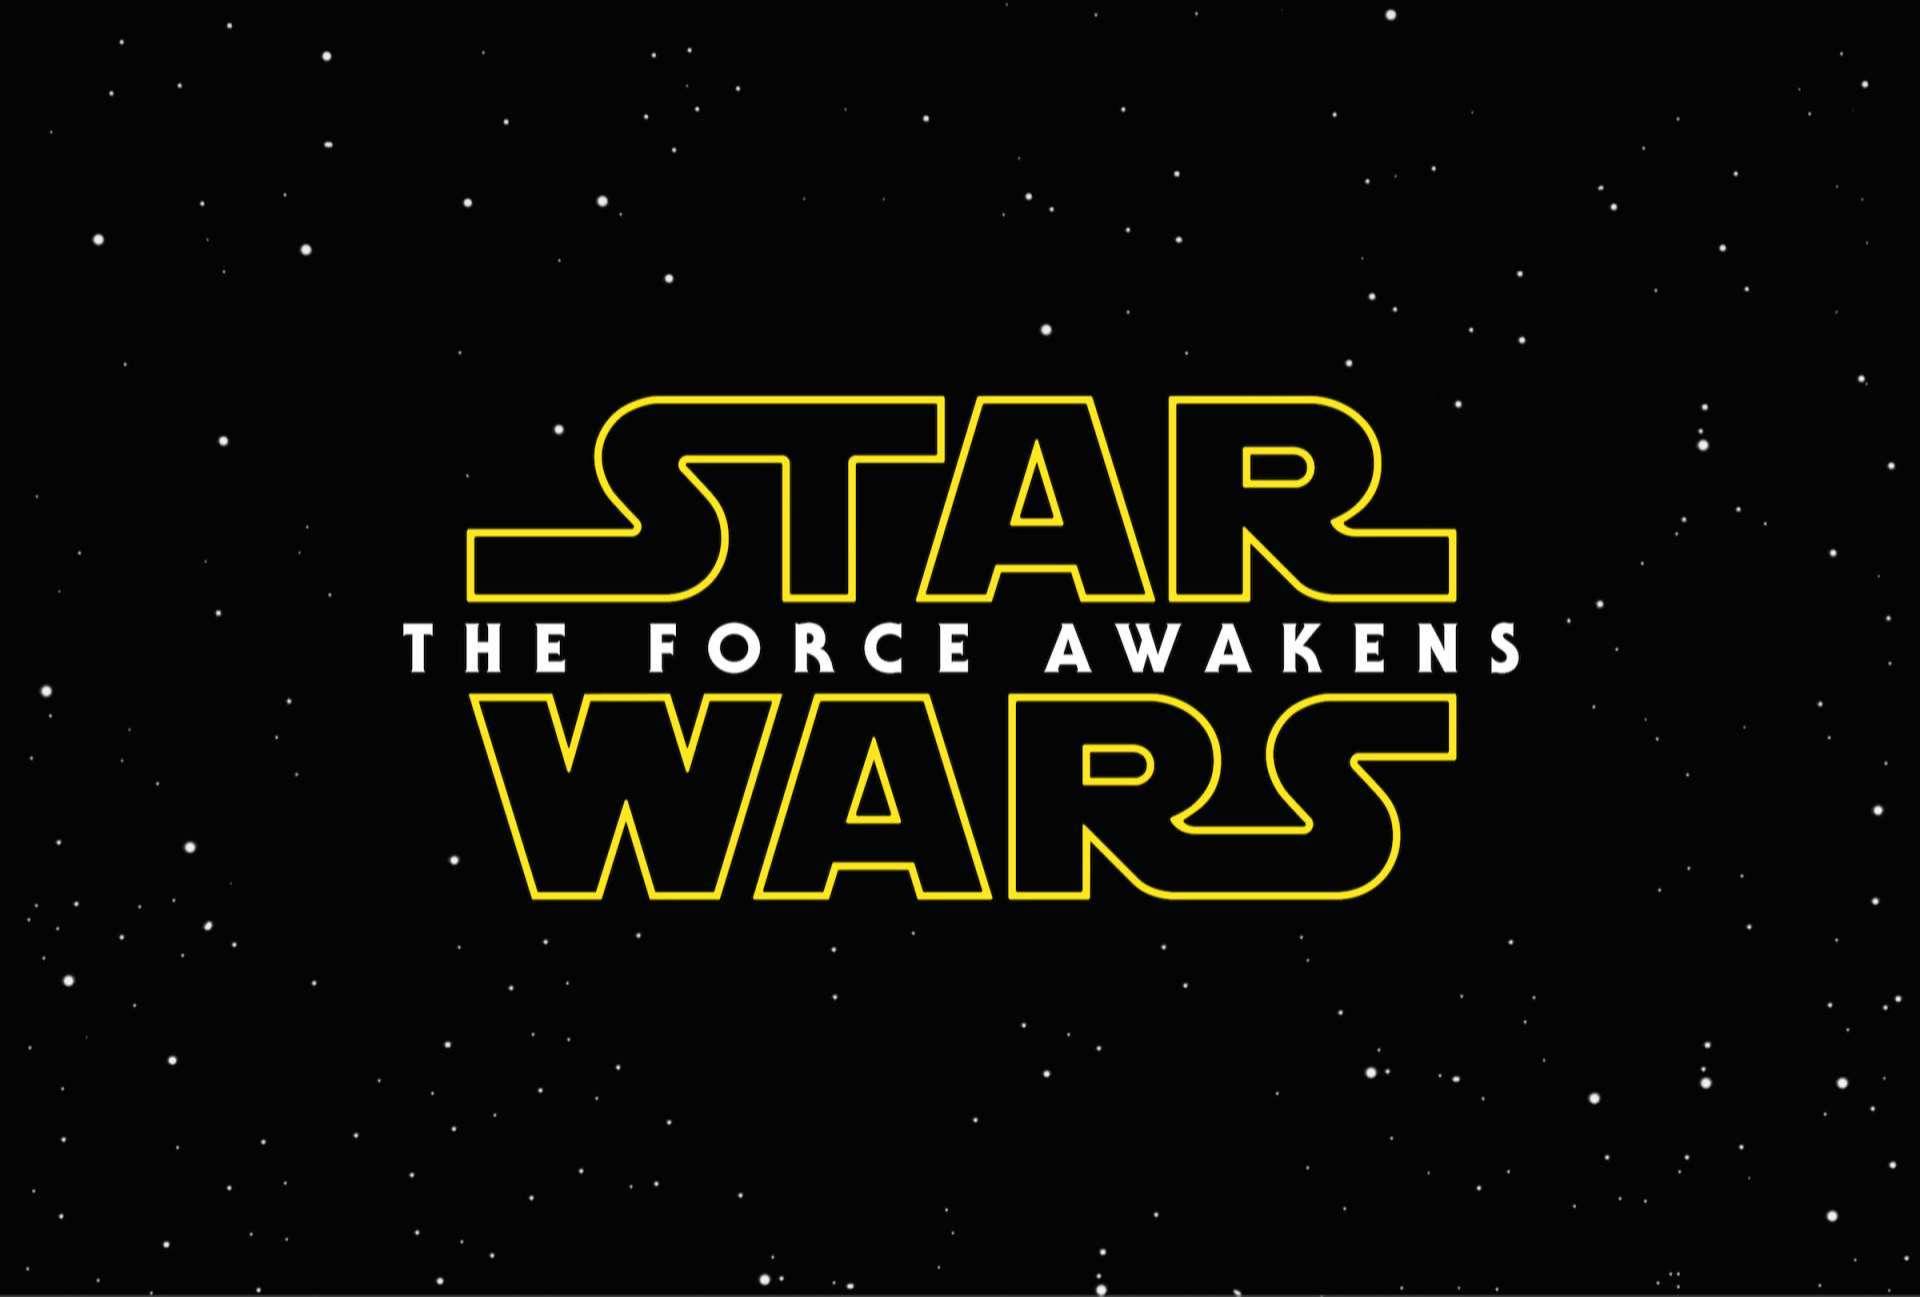 Star Wars Episode VII The Force Awakens Wallpaper 099